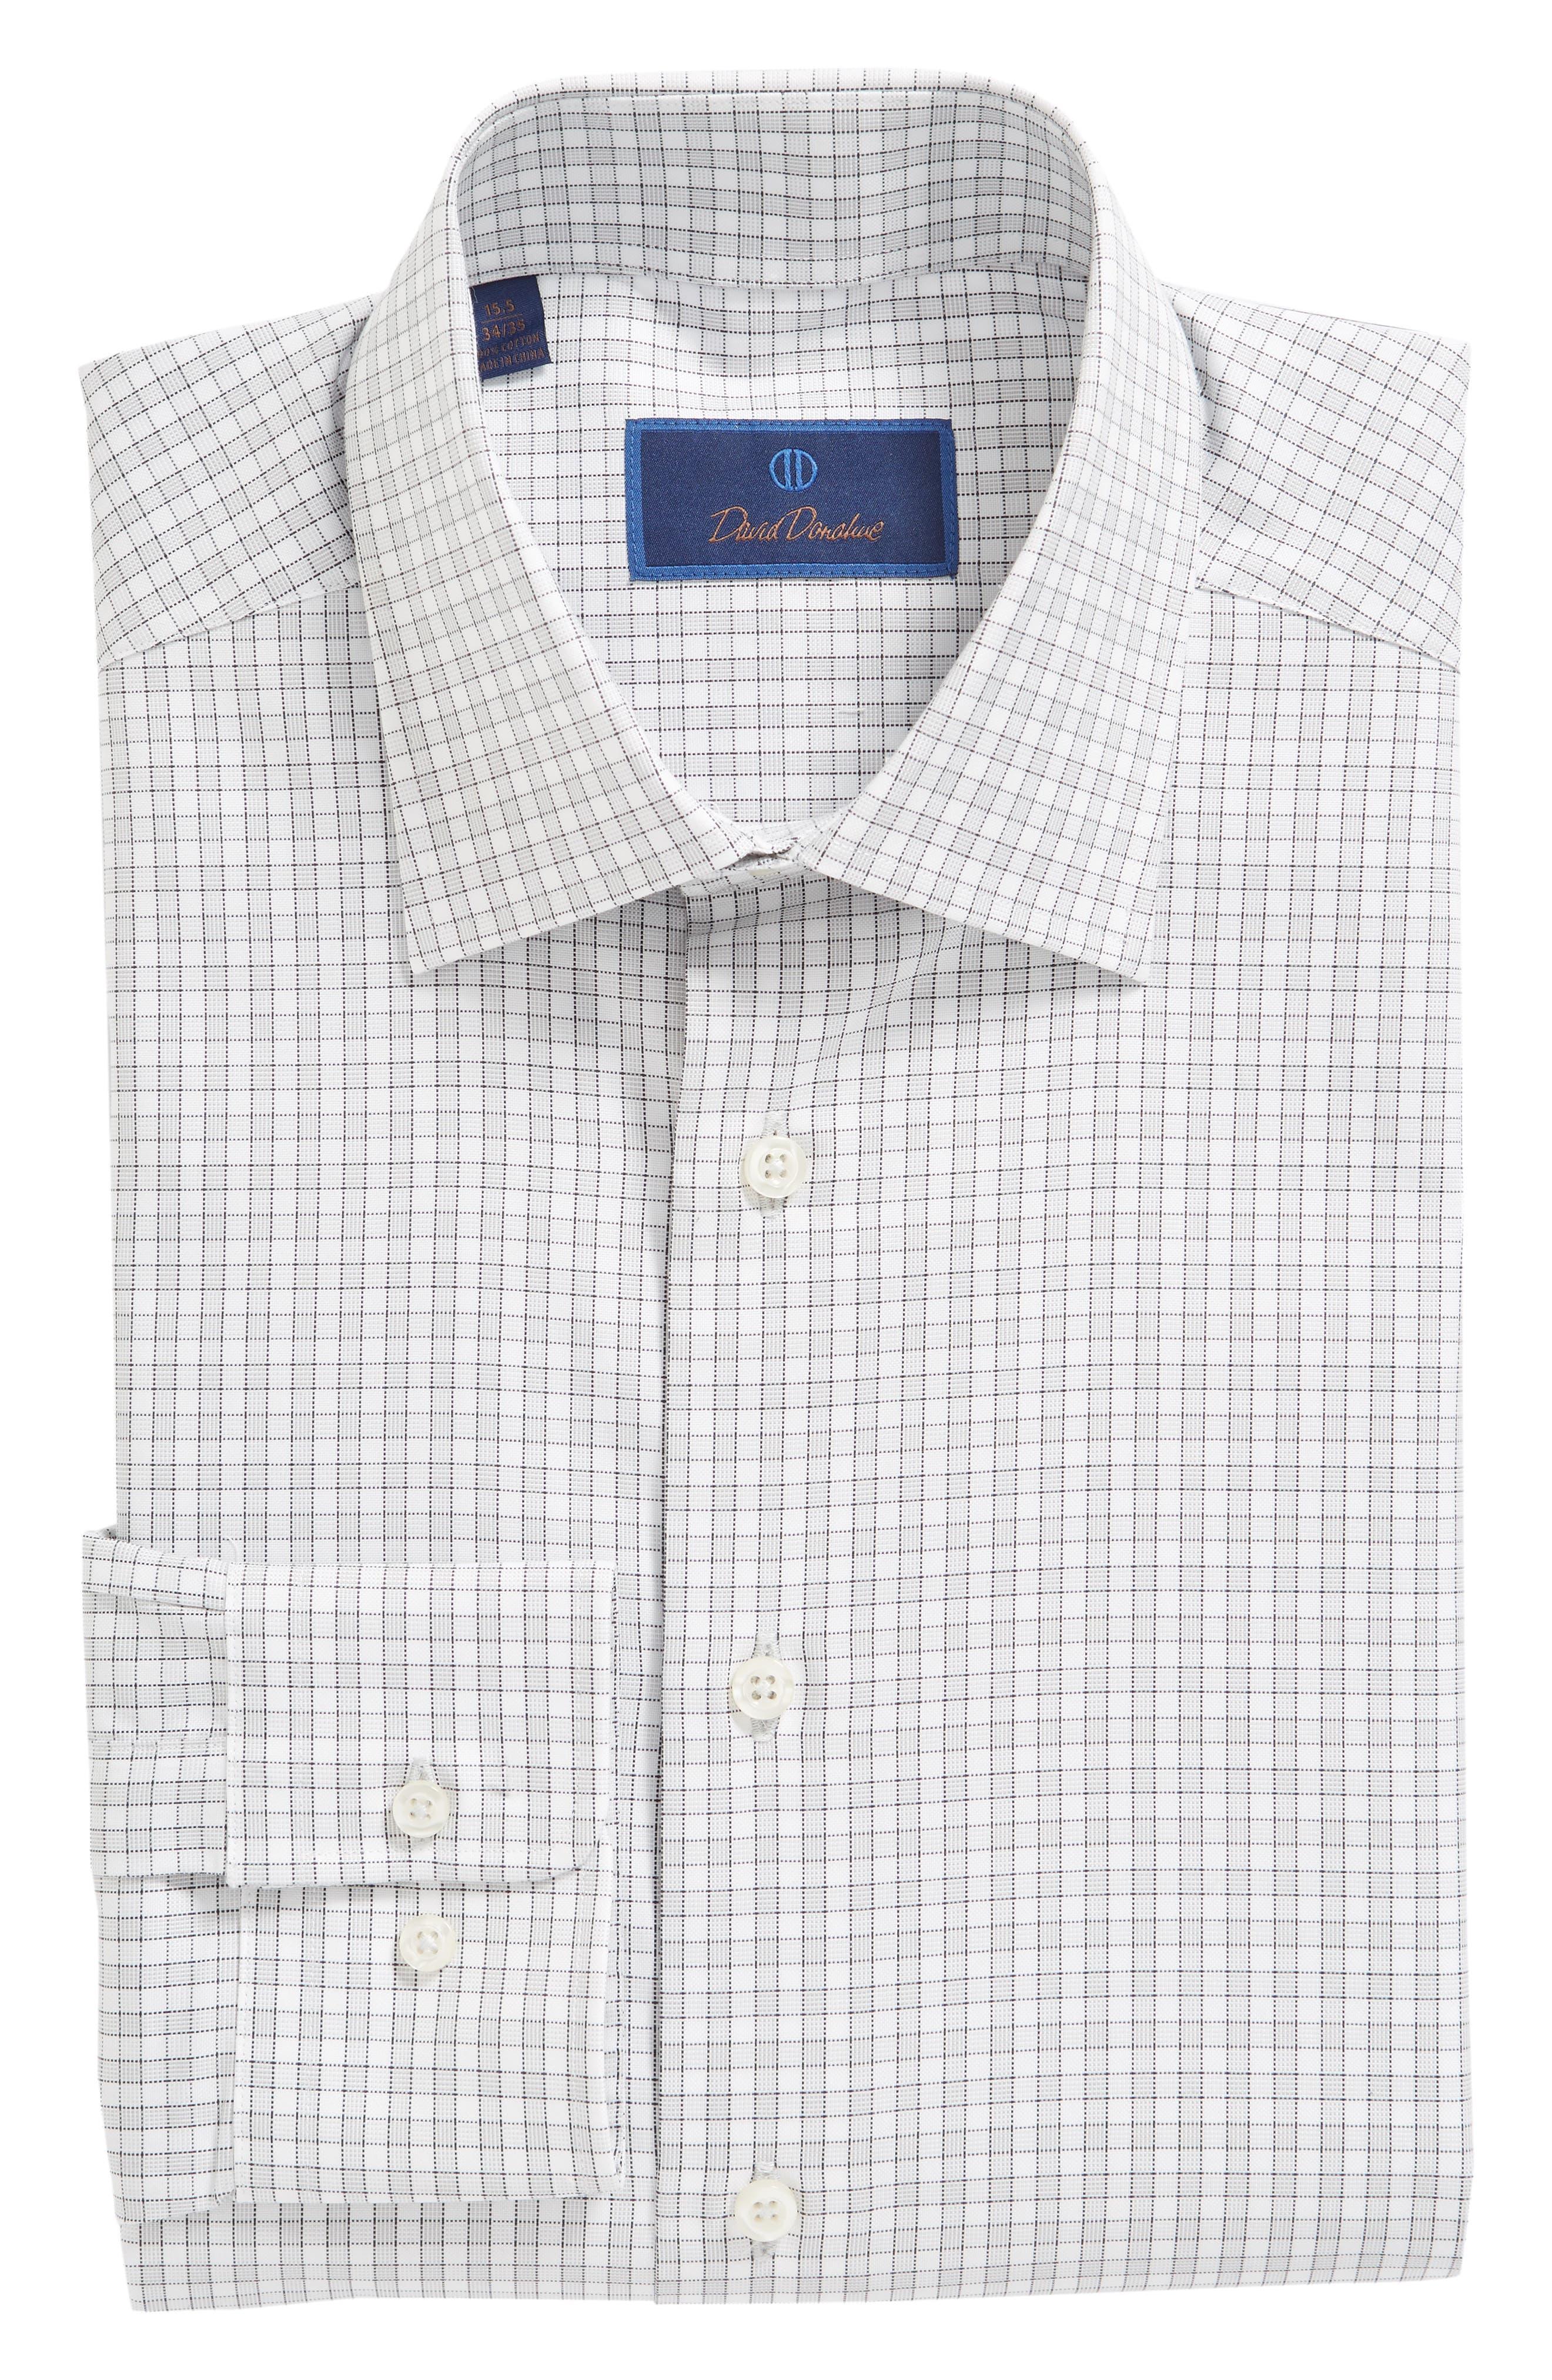 Regular Fit Check Dress Shirt,                             Alternate thumbnail 6, color,                             Gray